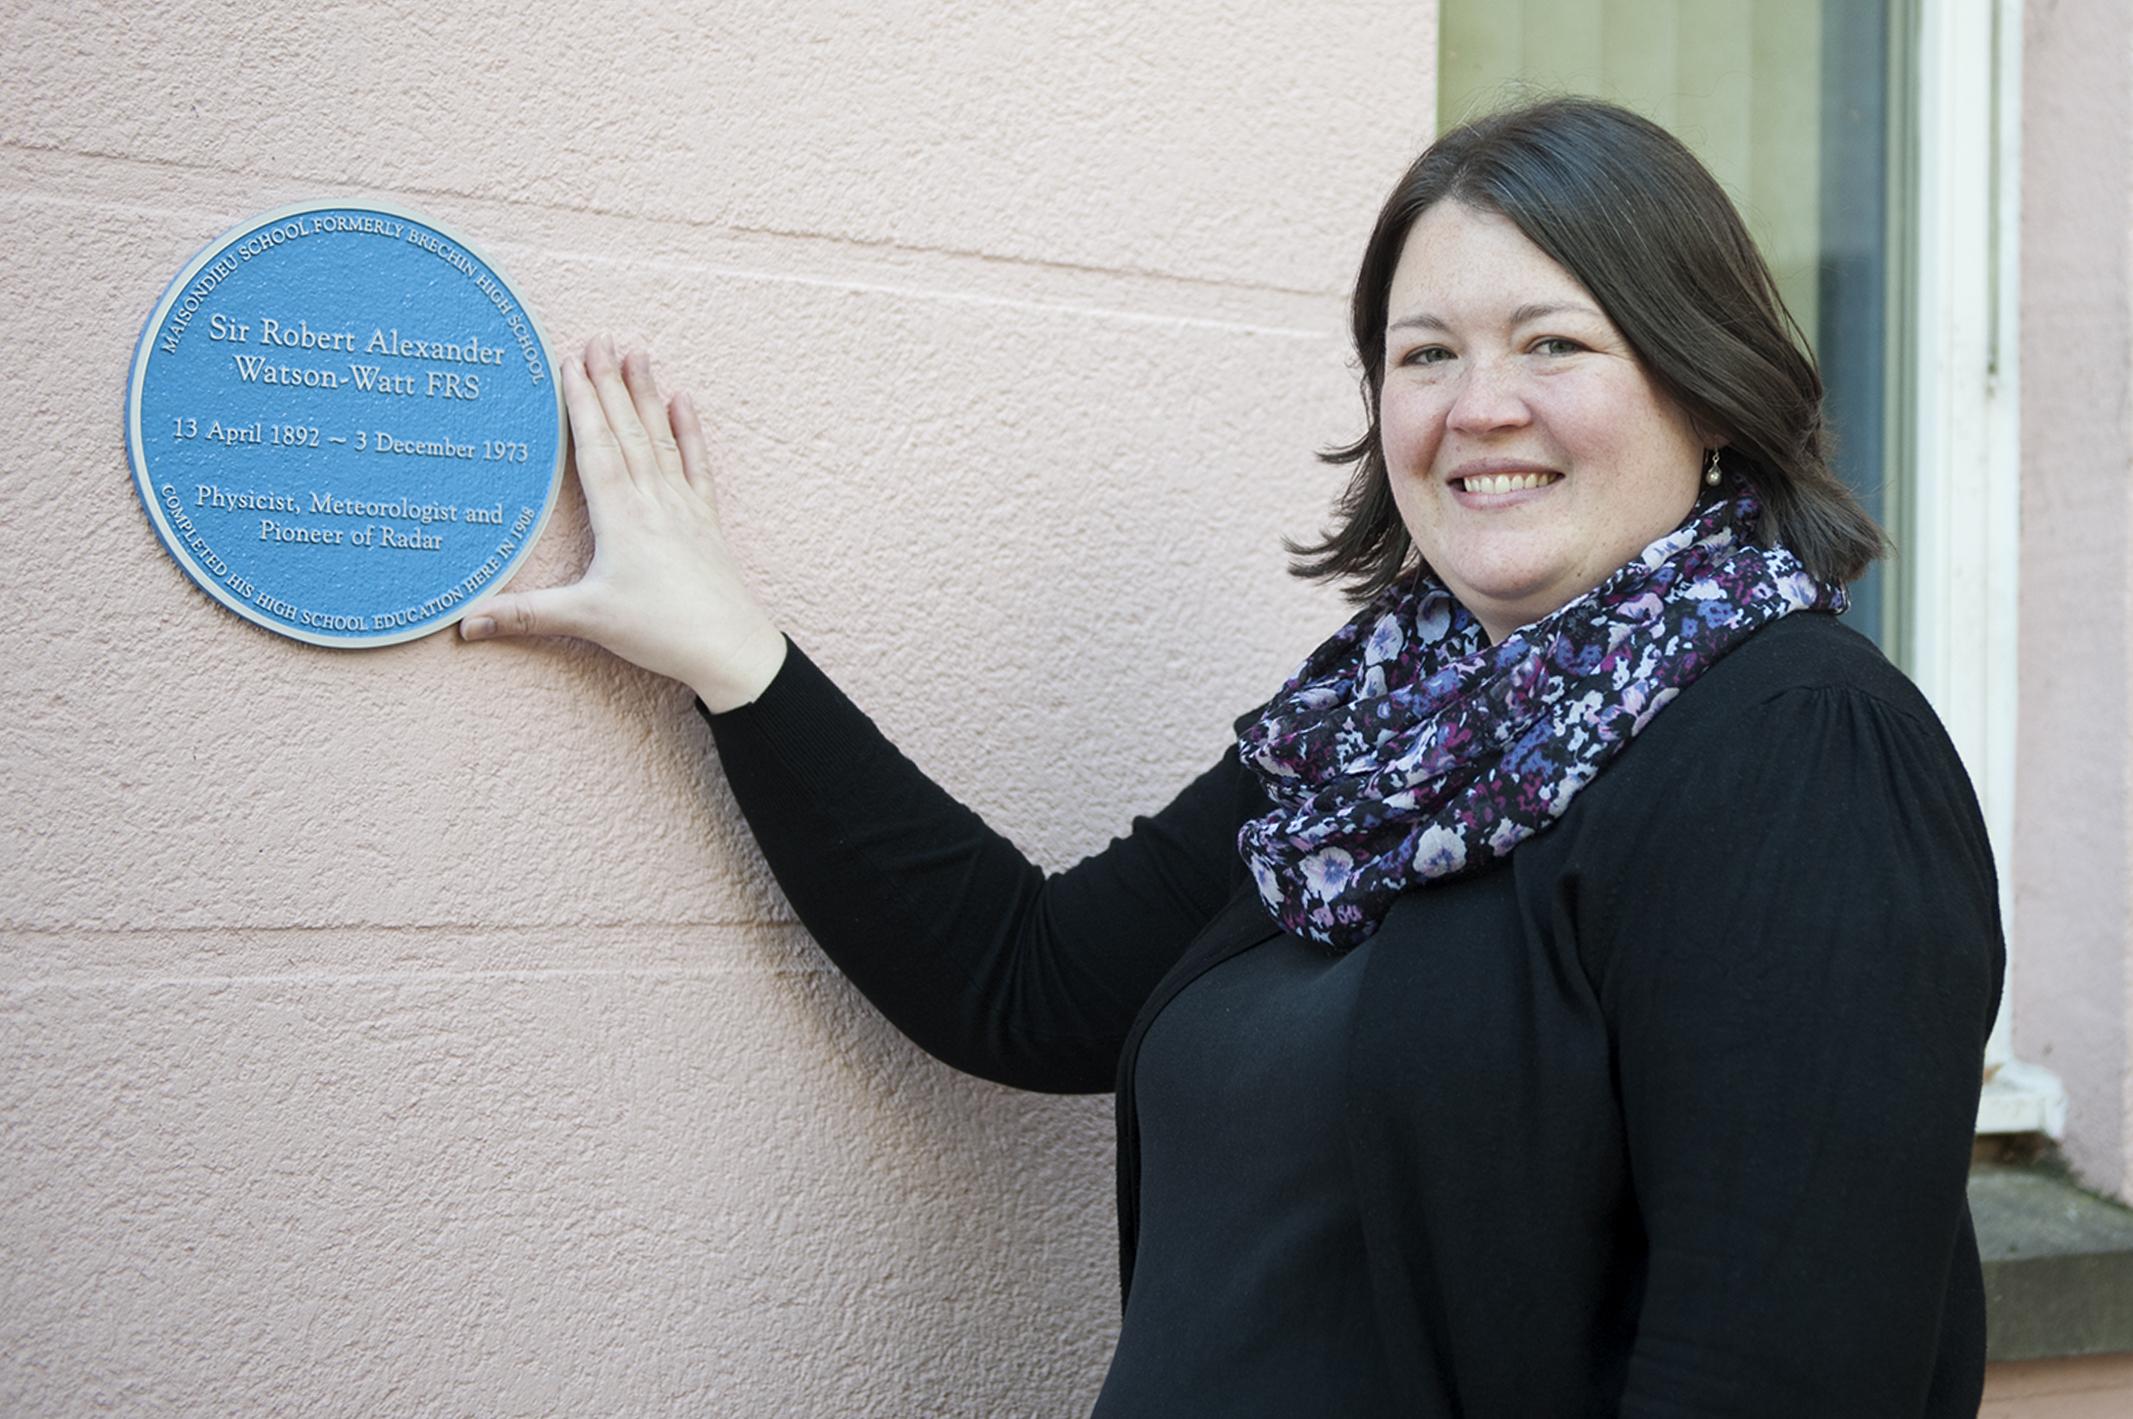 Deputy head teacher Sioehan Brown shows the plaque unveiled in memory of Robert Watson Watt.